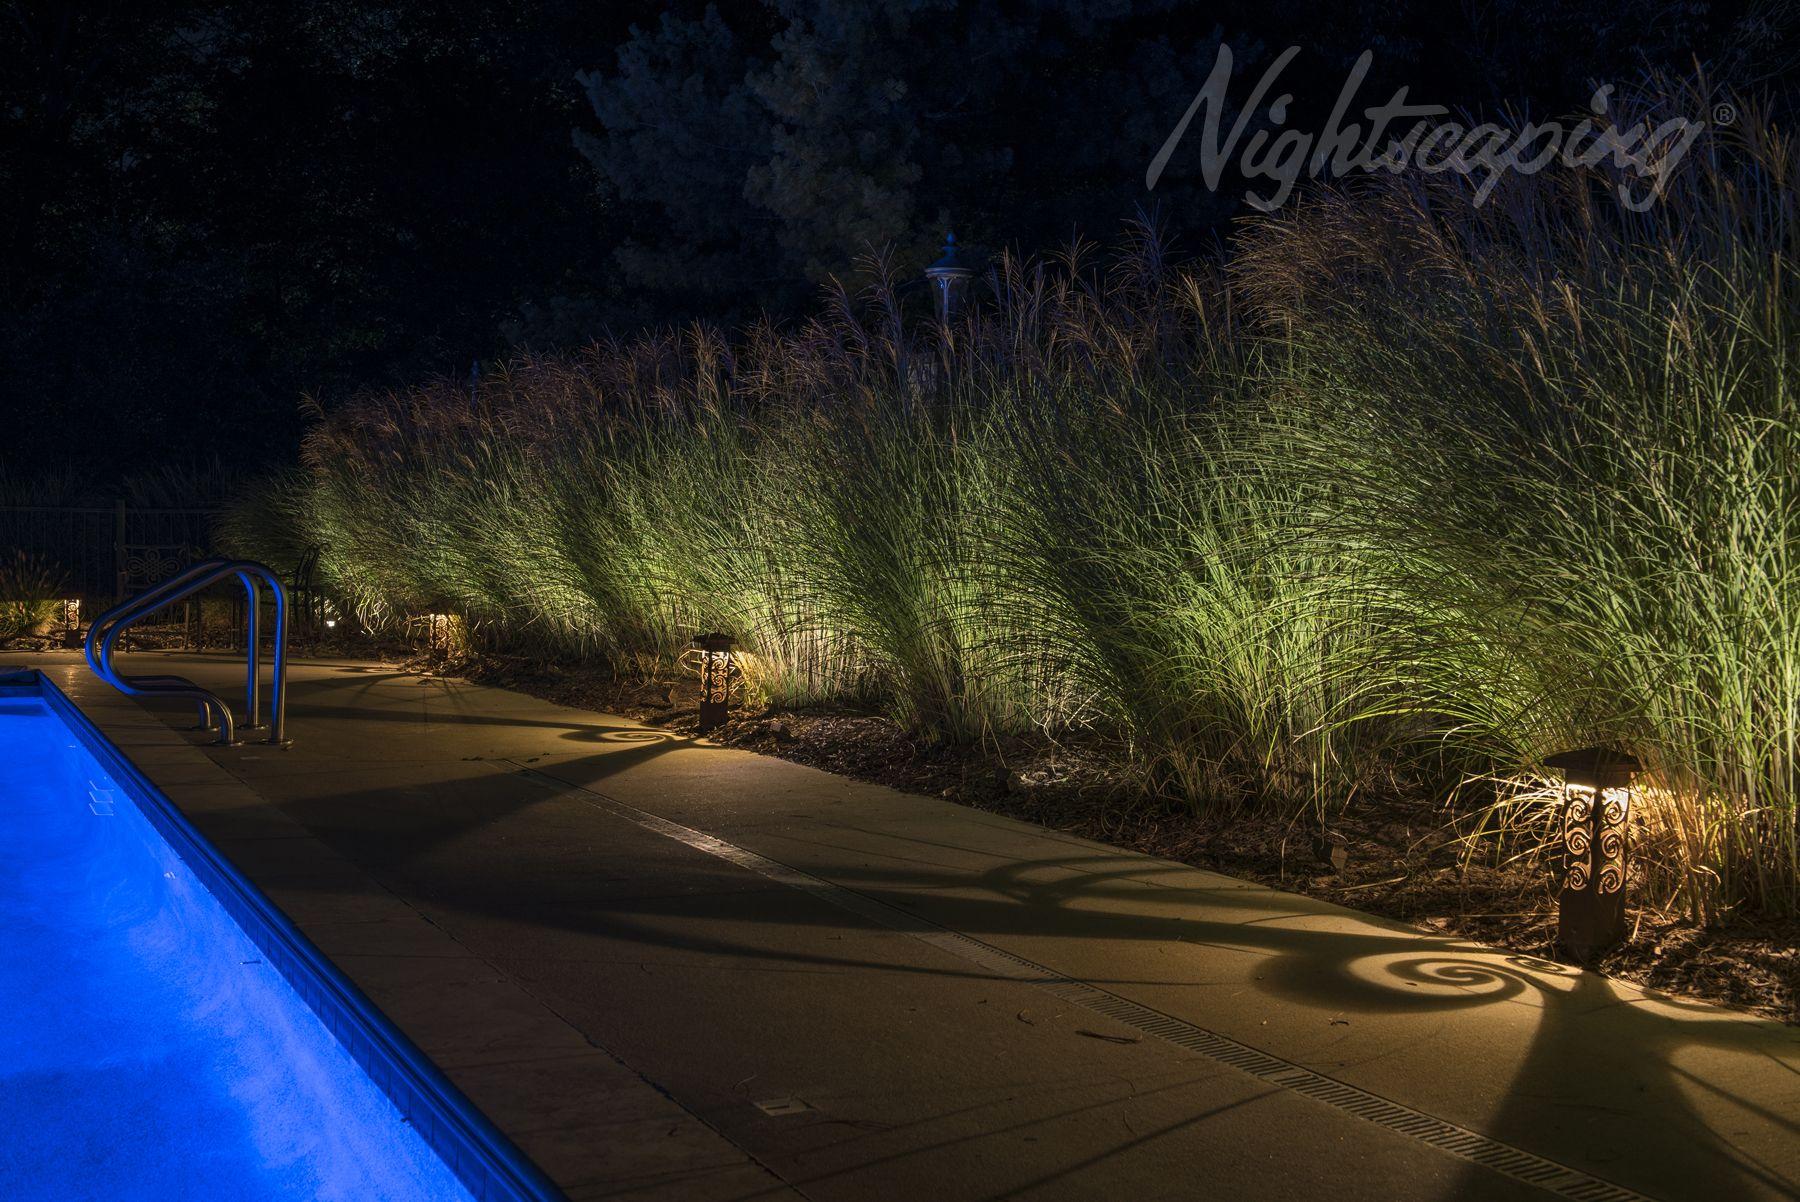 Nightscaping 6x6 Estate Series Spiral Design Corten Steel Landscape Lighting Bollards Nightscapin Landscape Lighting Bollard Lighting Outdoor Light Fixtures